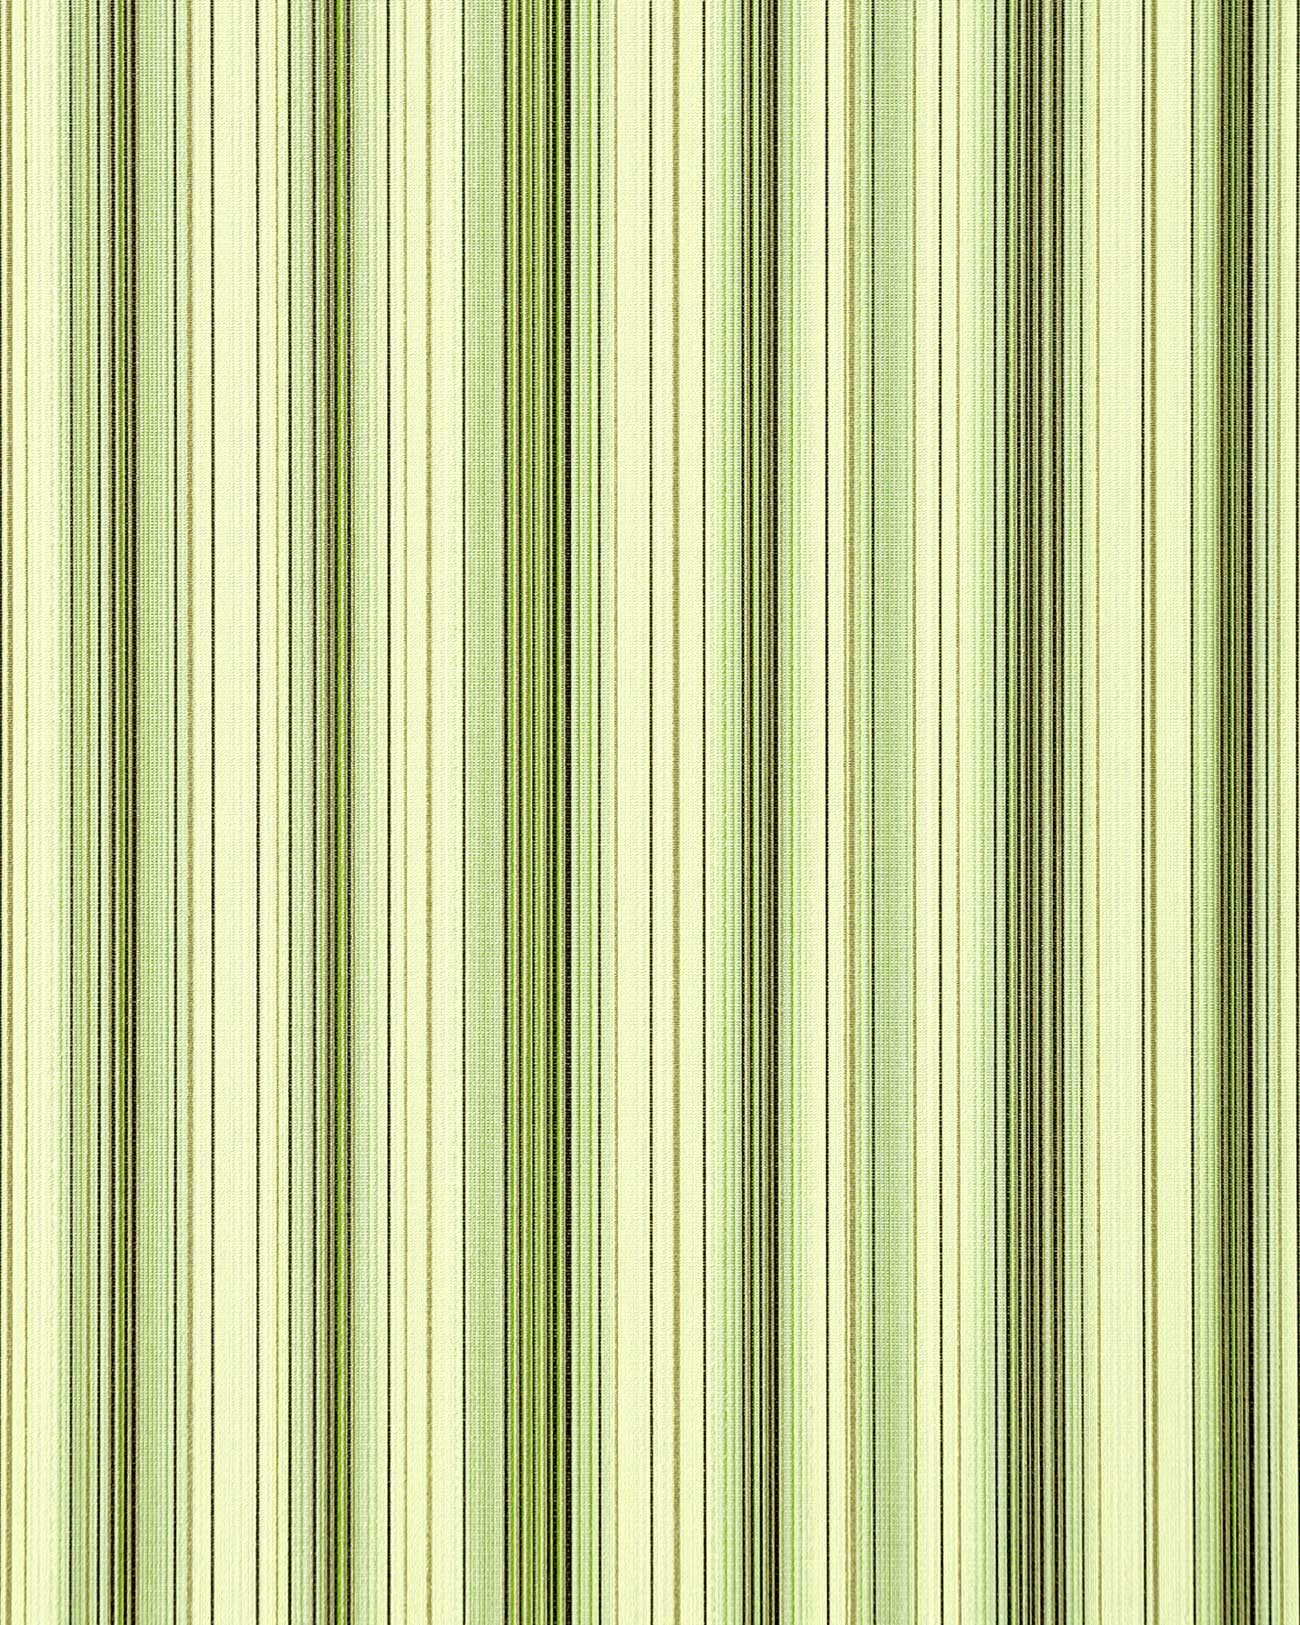 Barok behang vinyl behang edem 097 25 gestreept klassieke strepen modern en fraai groen wit goud - Behang zwart en goud ...